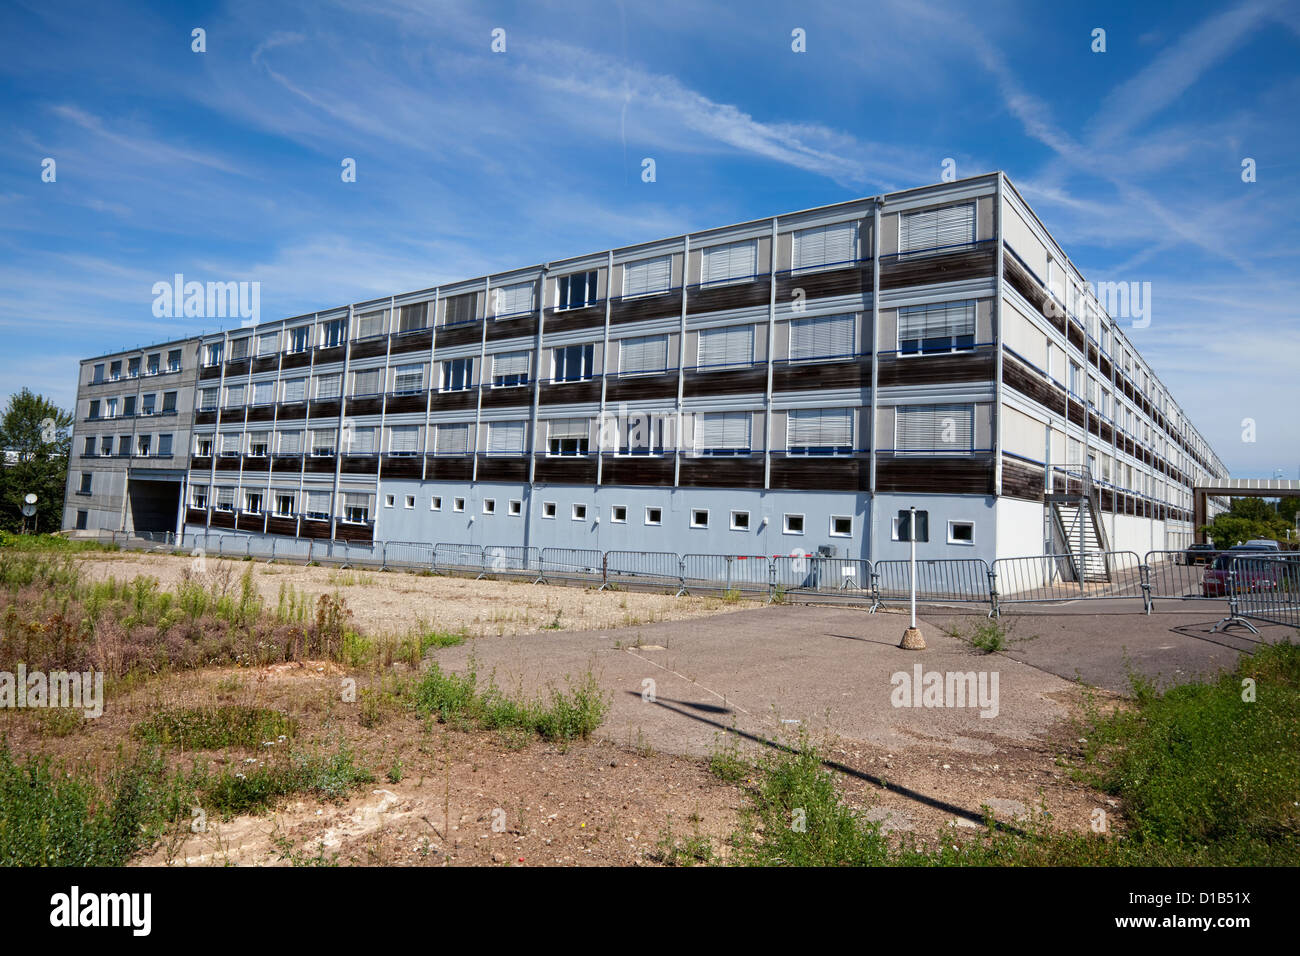 Containerbau, Europäischen Gerichtshof, Kirchberg, Luxemburg Stadt, Europa Stockbild